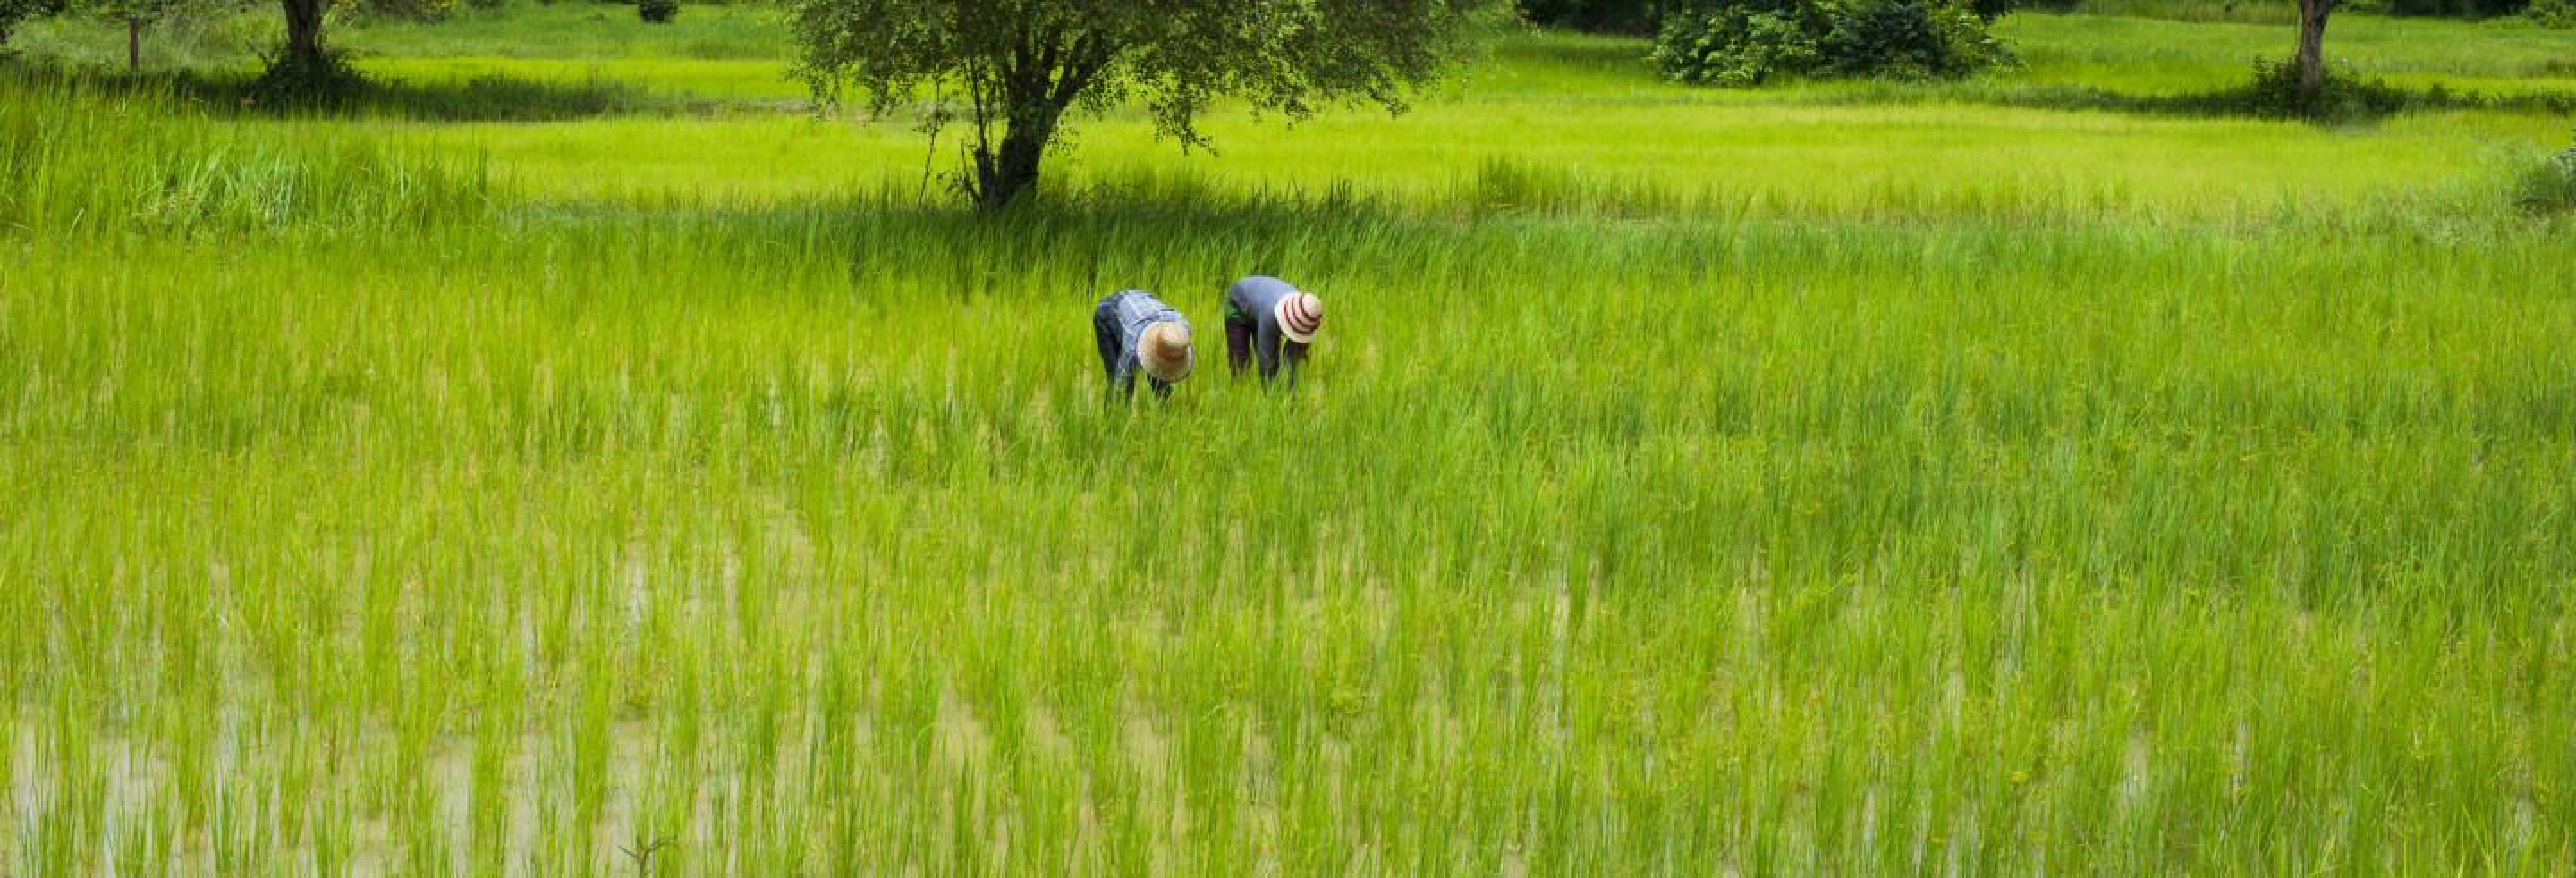 Tour de tuk tuk por Battambang